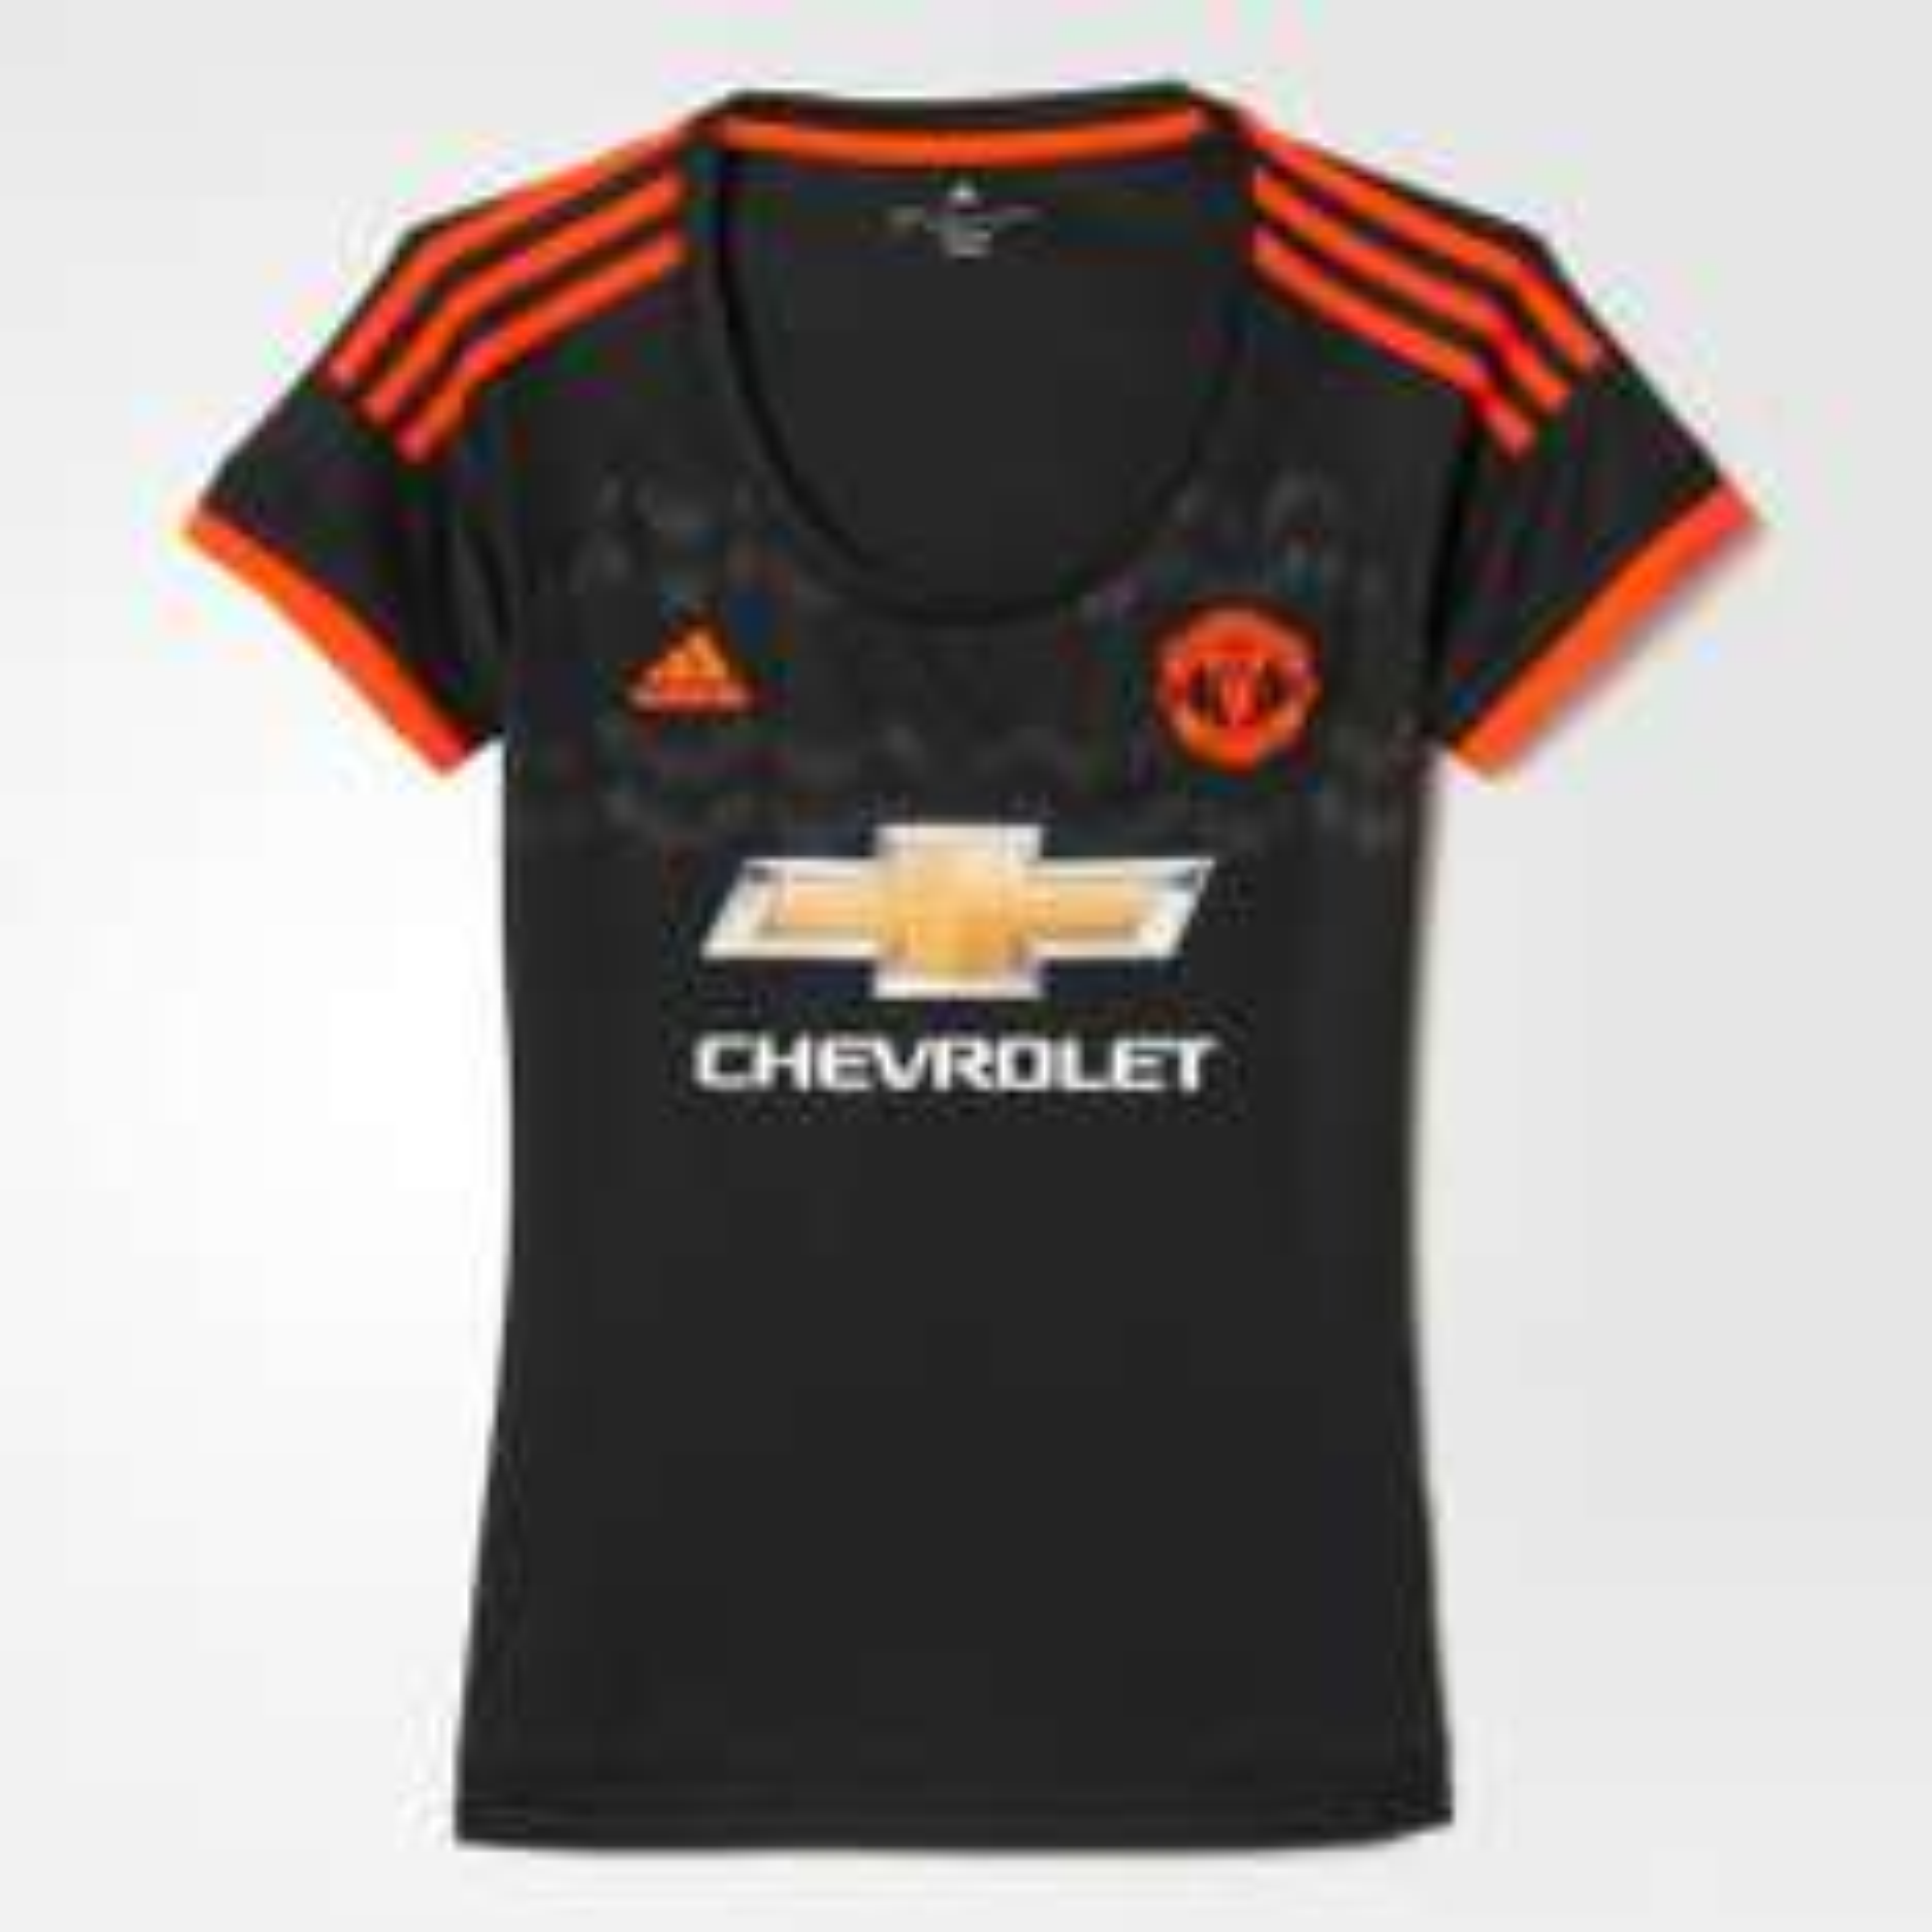 Adidas: Jersey Tercero Manchester United 2015/2016 Mujer de $1,099 a $329 Talla G